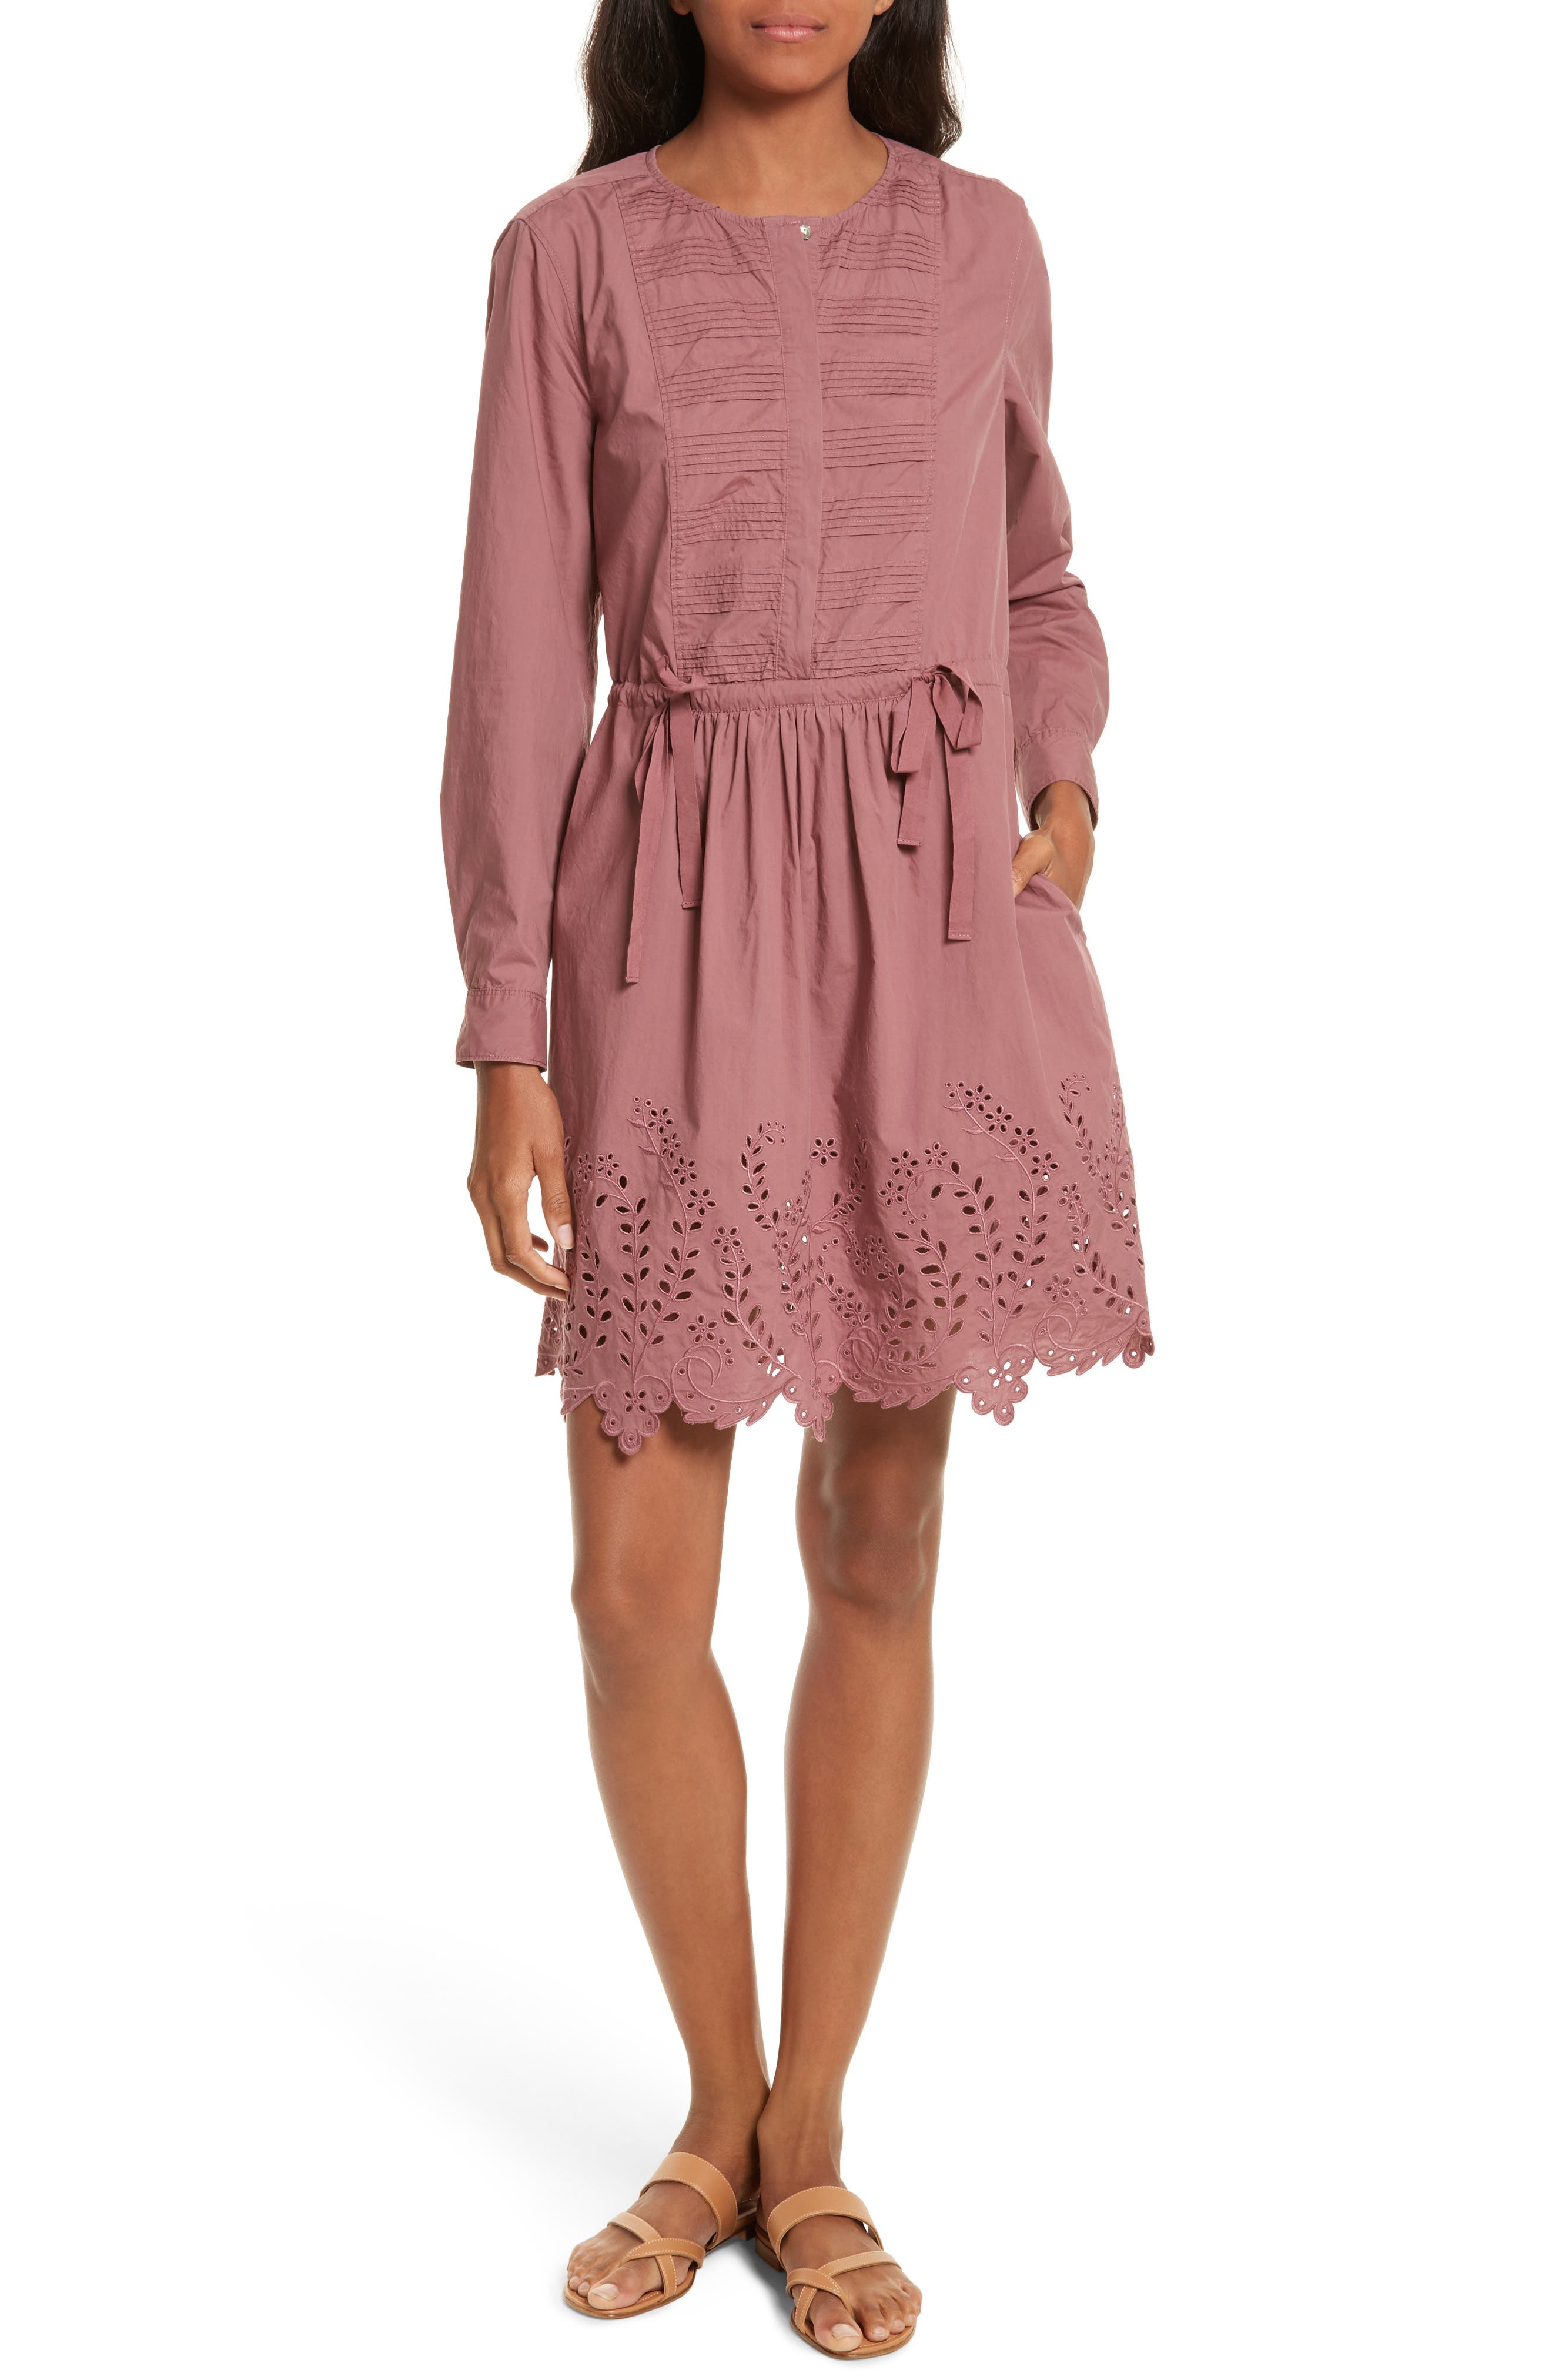 La Vie Rebecca Taylor Eyelet Poplin Dress